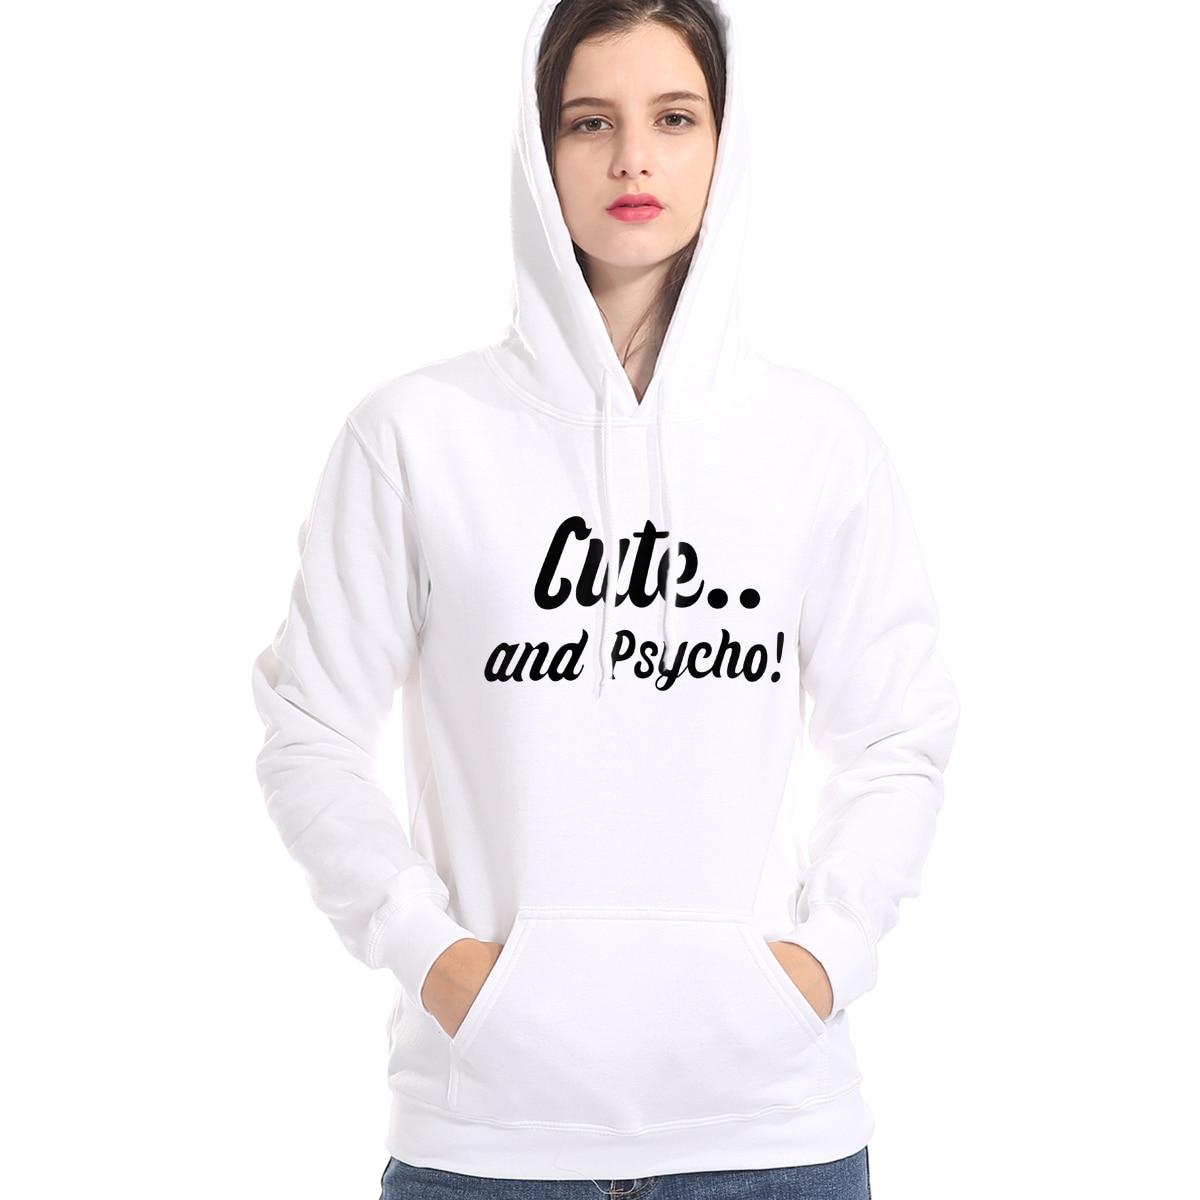 Sweatshirt For Women Hoody 2019 Autumn Winter Fleece Long Sleeve Hoodie Harajuku Coat CUTE AND PSYCHO Women's Hoodies Lady Tops